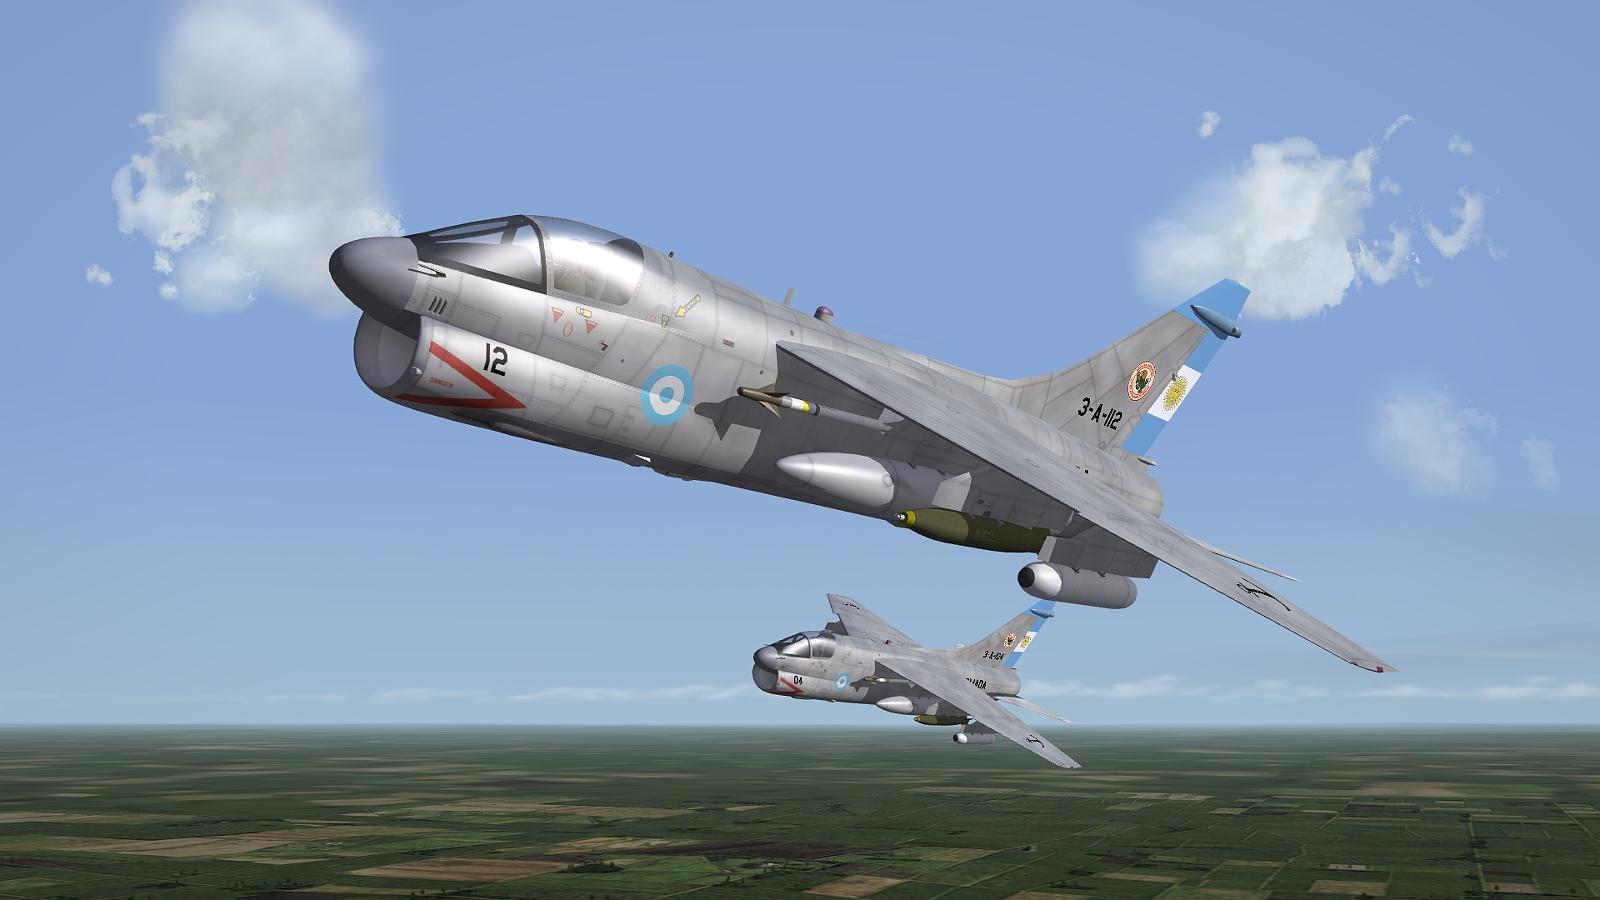 [Fictional] Vought A-7R Corsair II - Argentine Navy